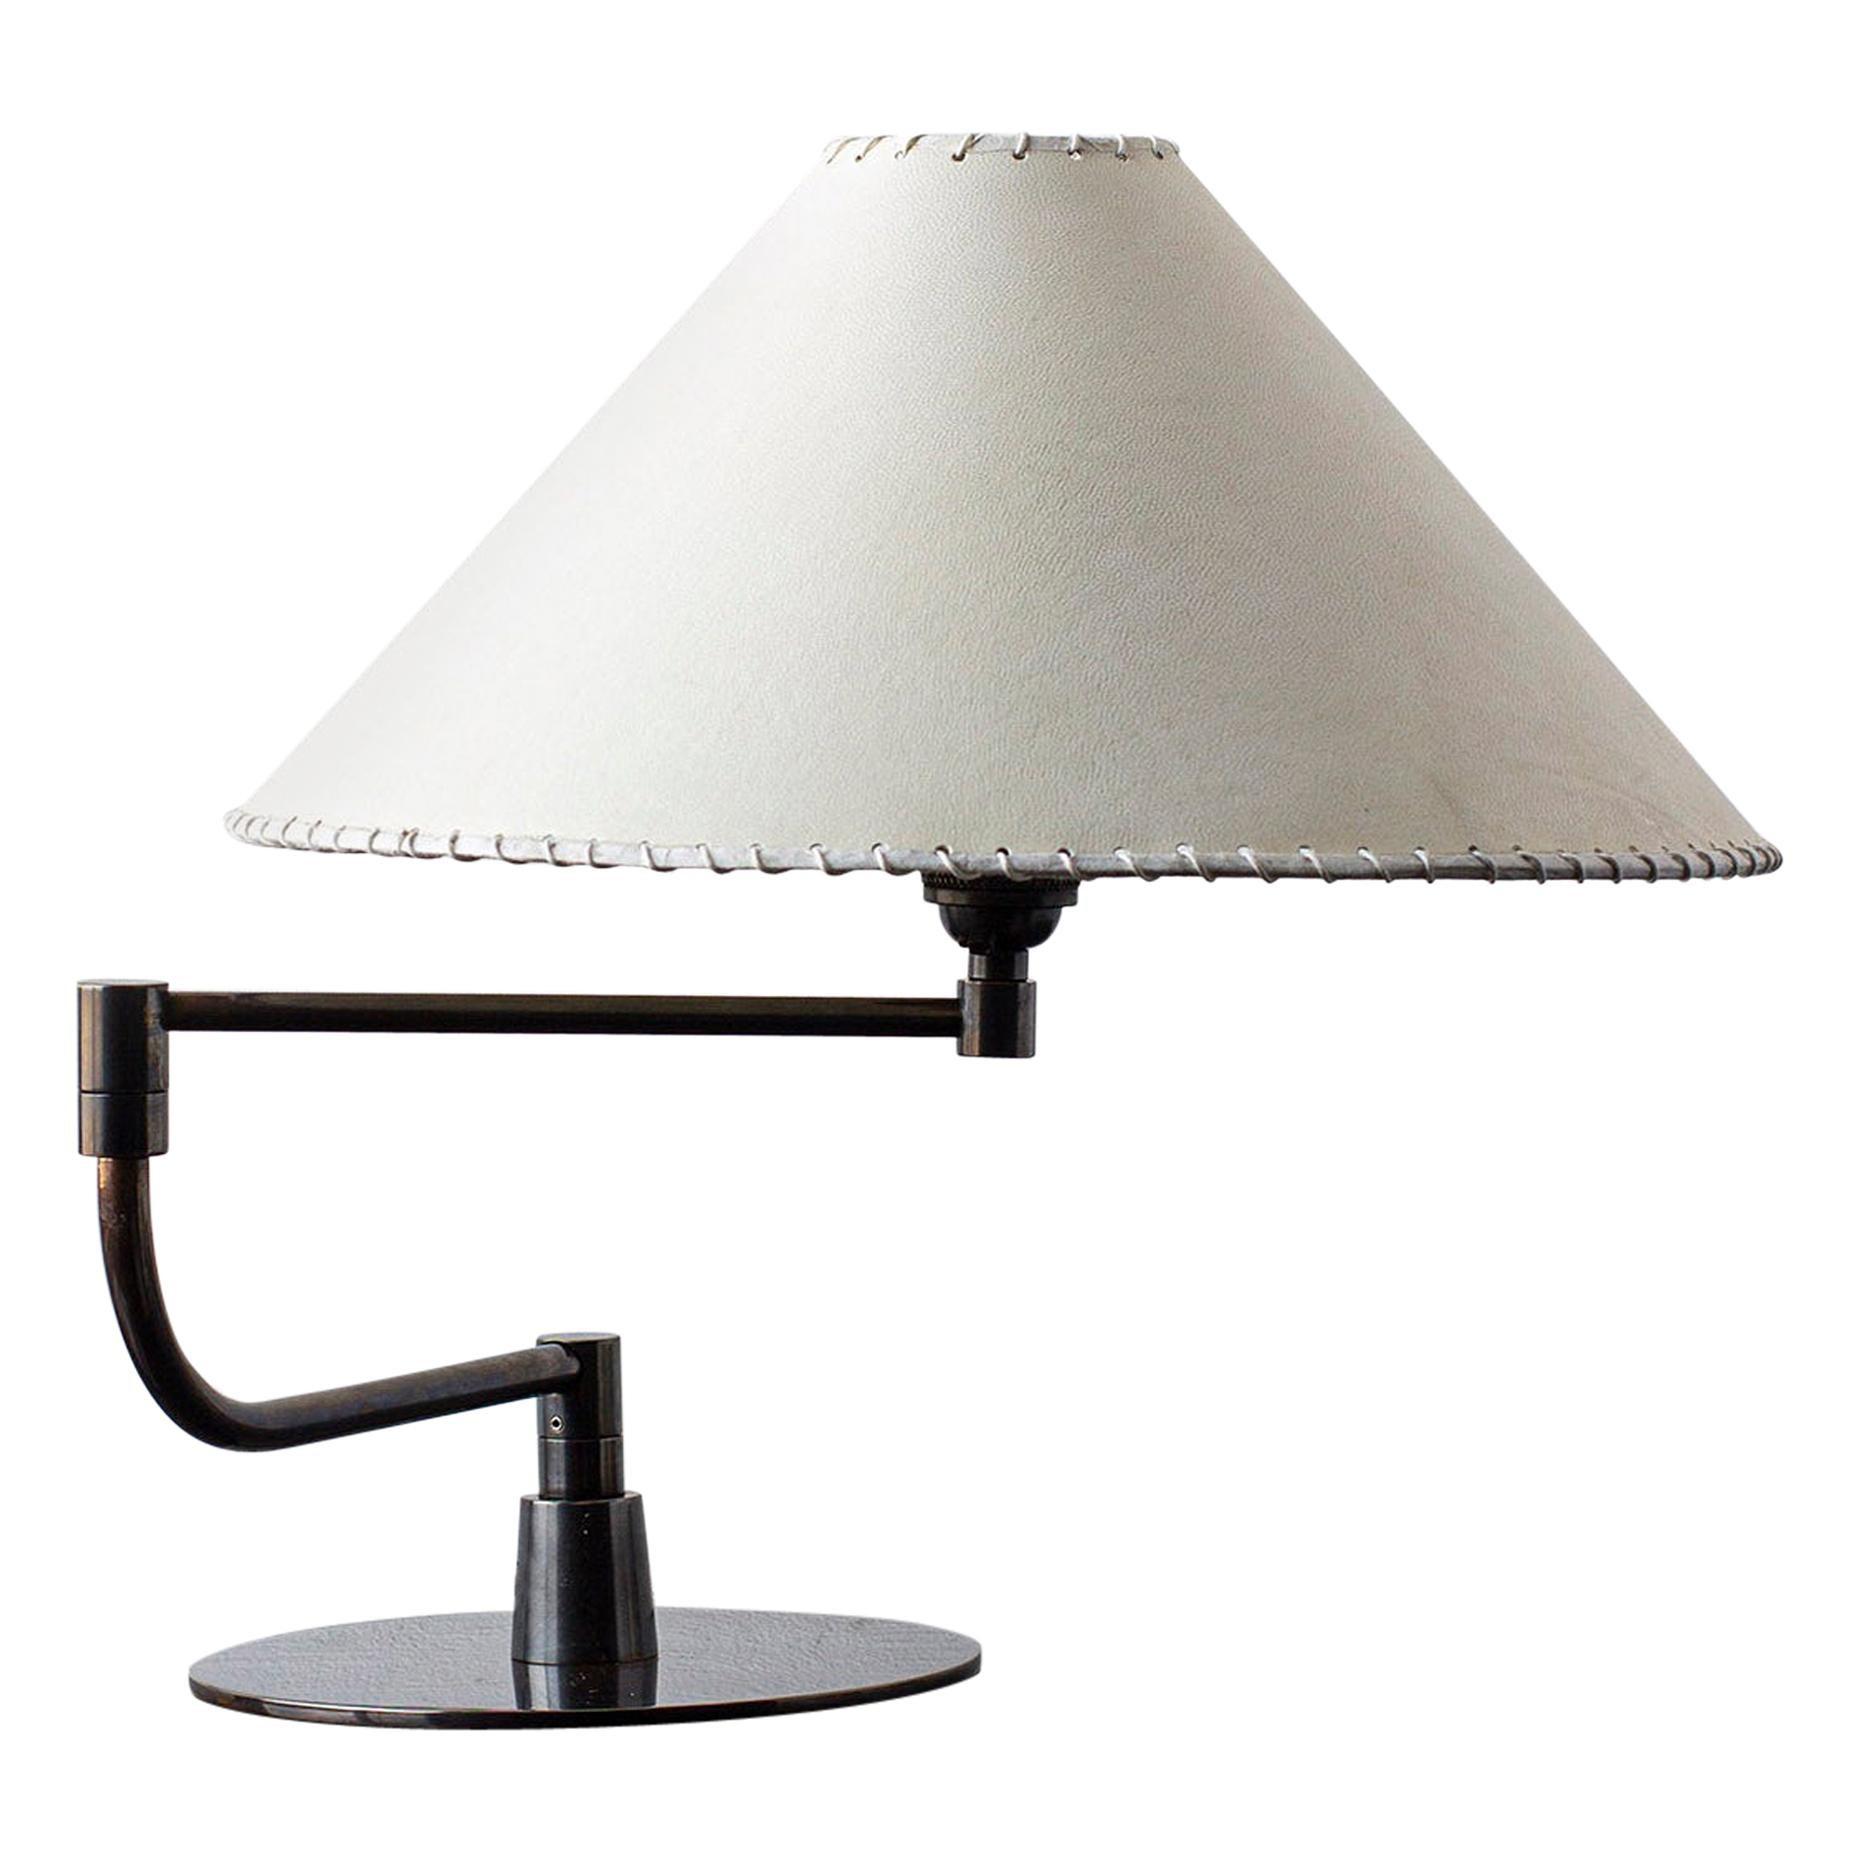 Series04 Pivot-Arm Desk Lamp, Dark Patinated Brass, Goatskin Parchment Shade